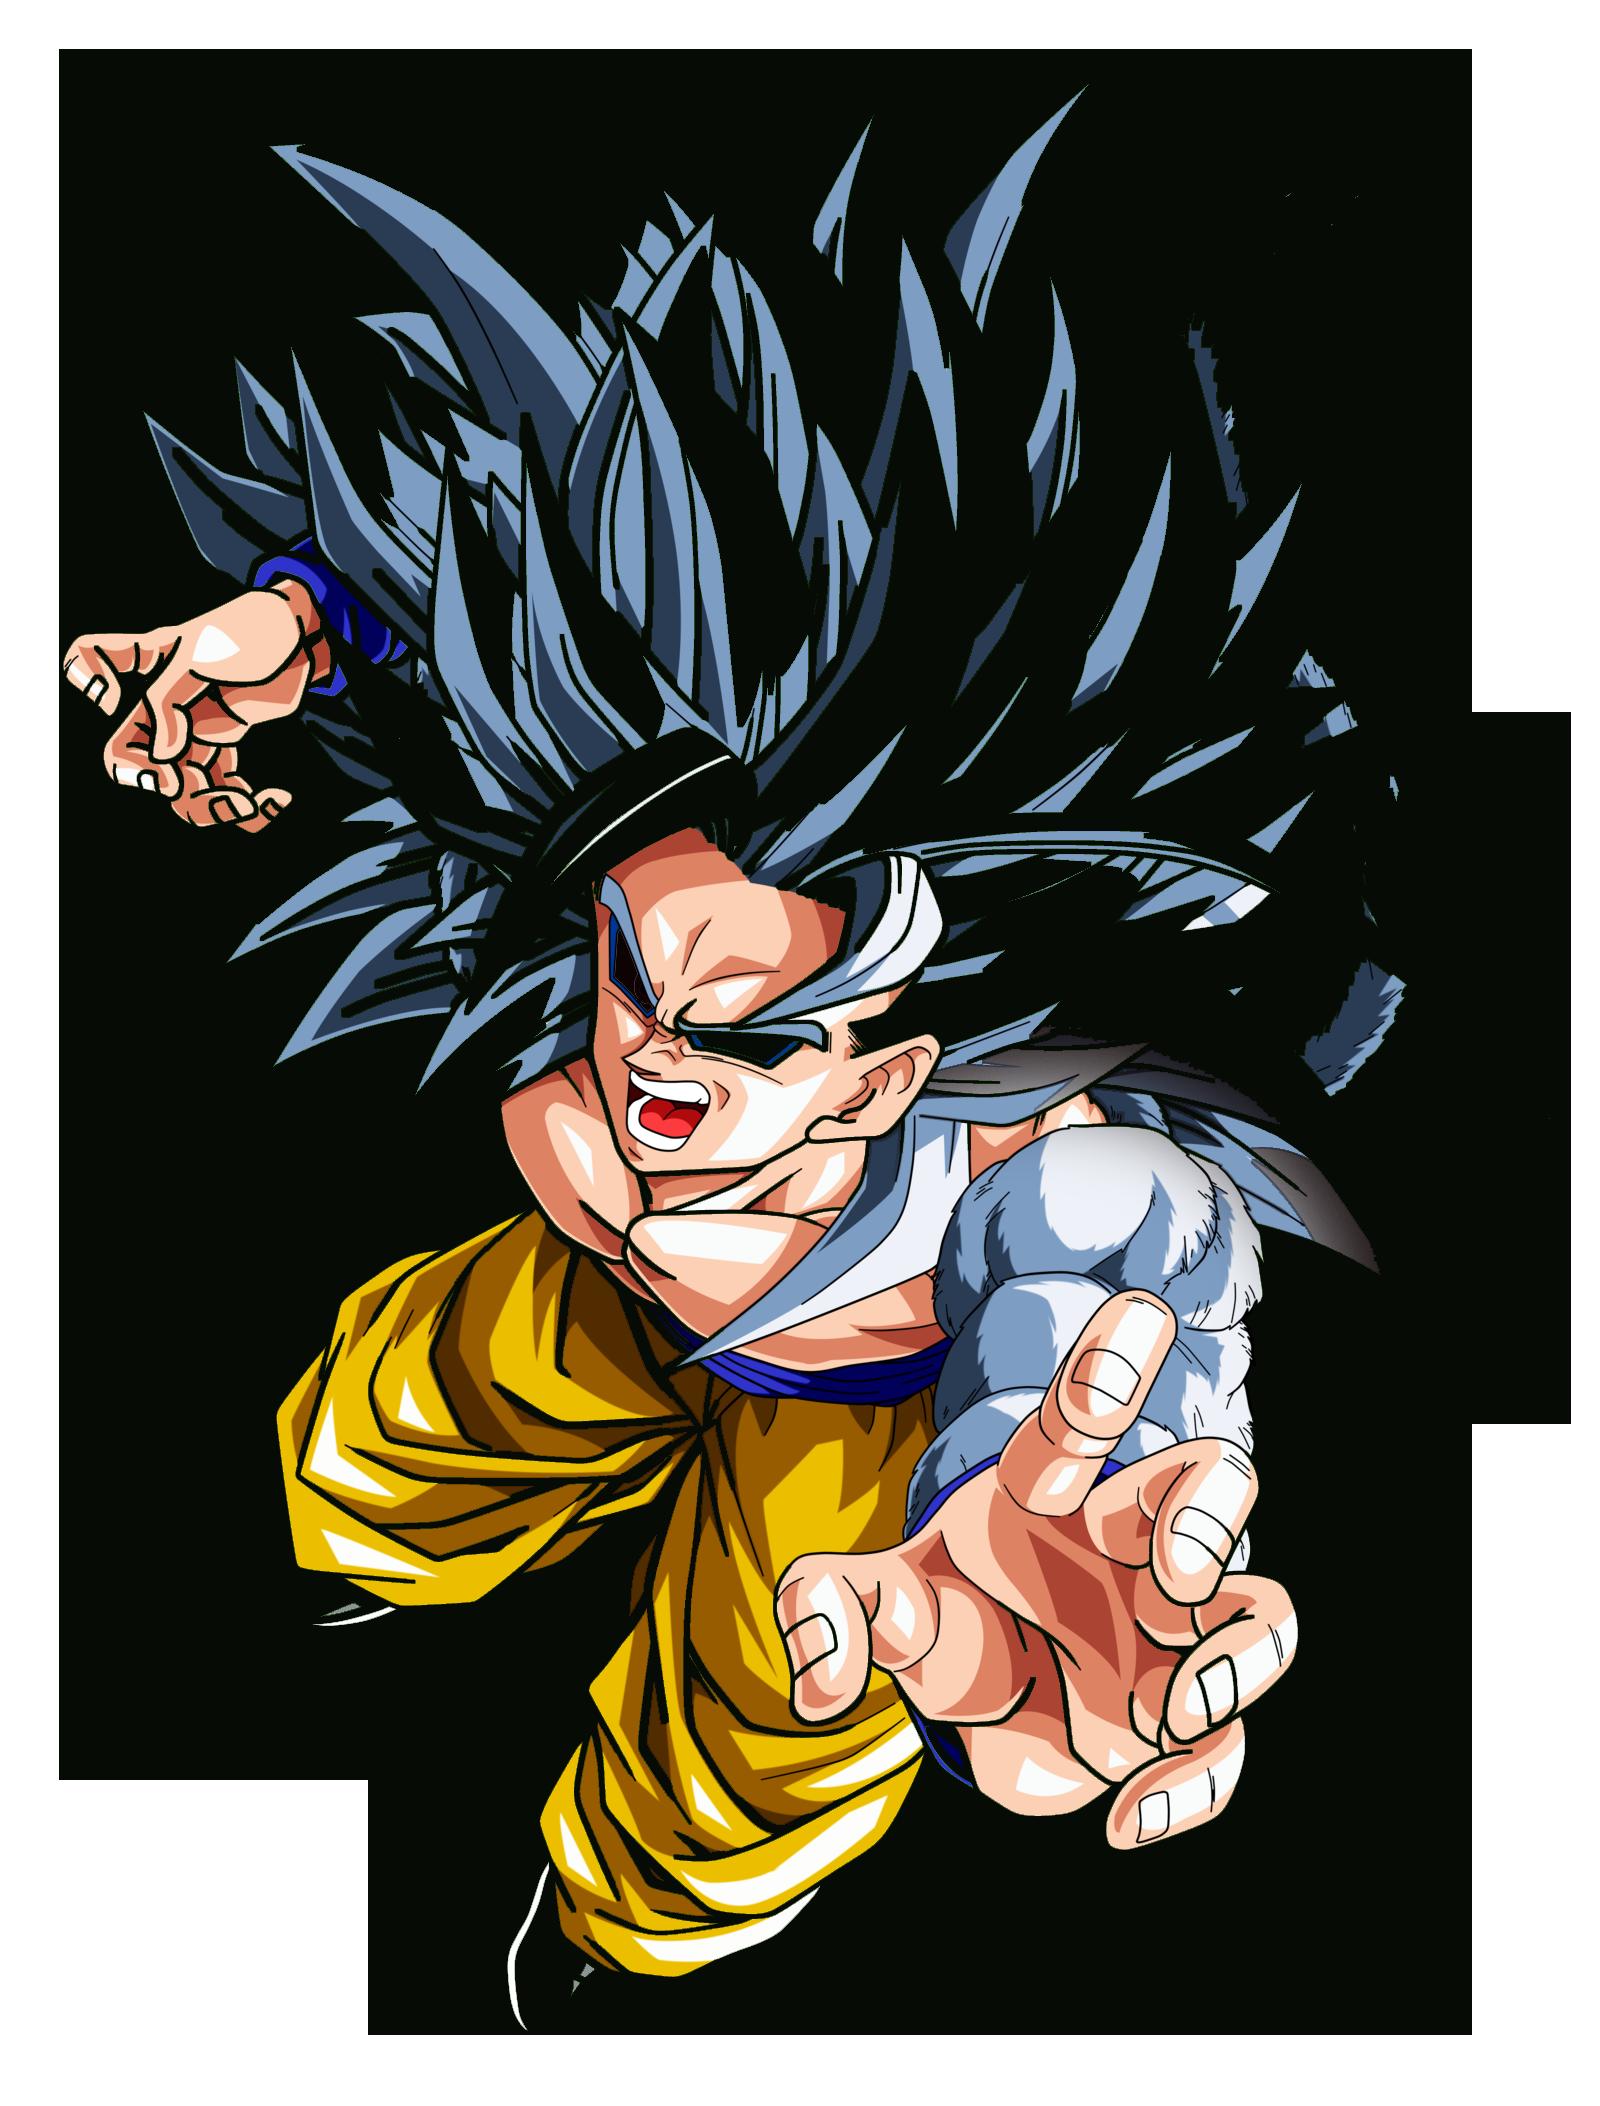 Goku Drawing Super Saiyan 5 Free Download On Clipartmag